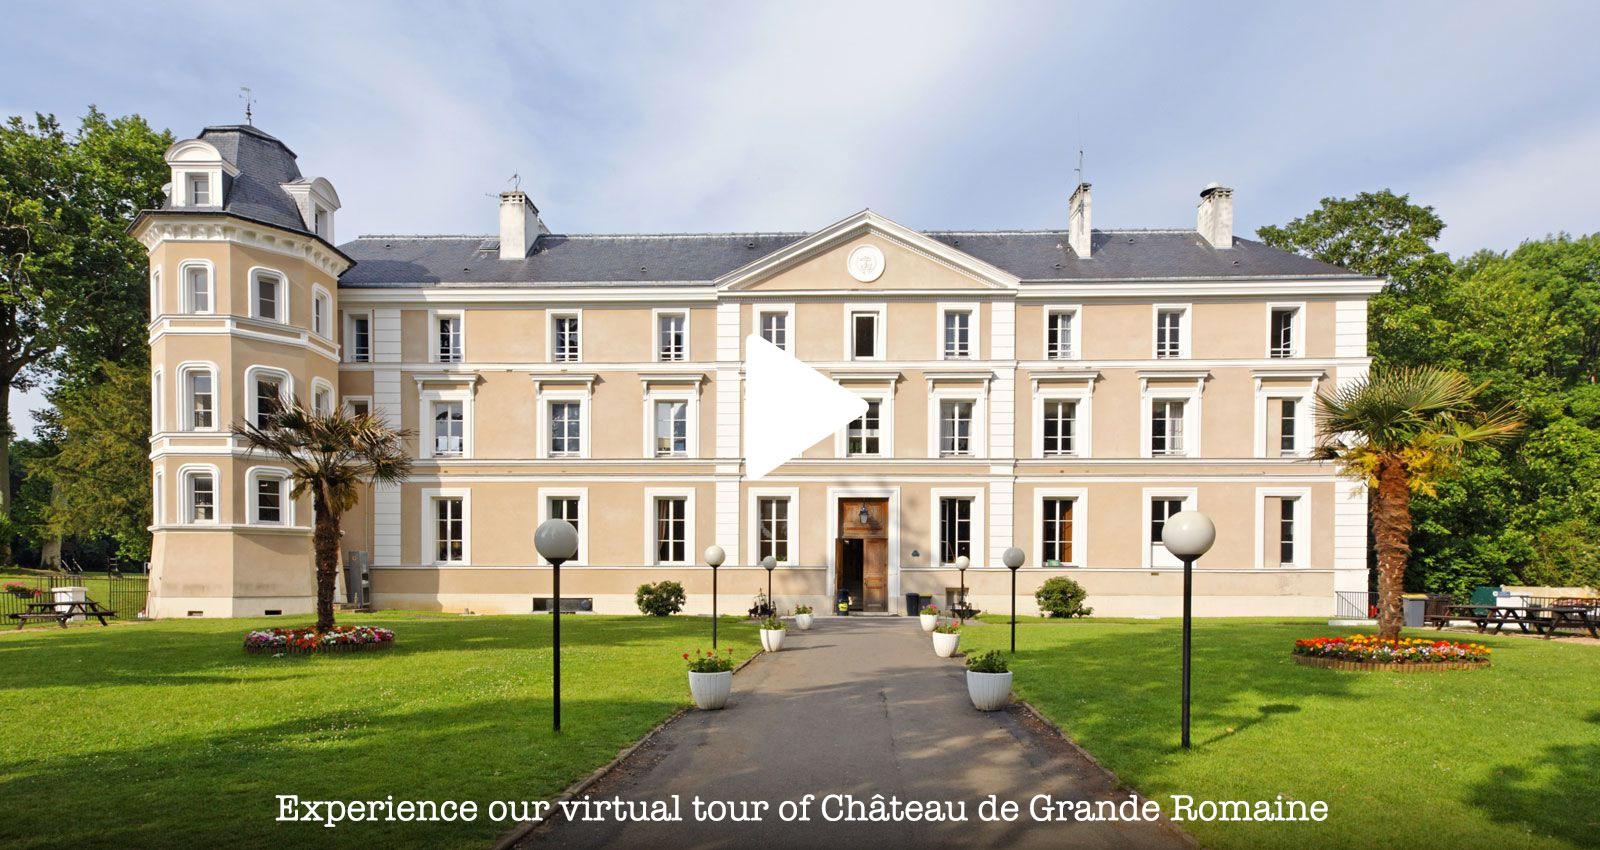 Pgl chateau de grande romaine adventure holidays and for Chateau hotel paris